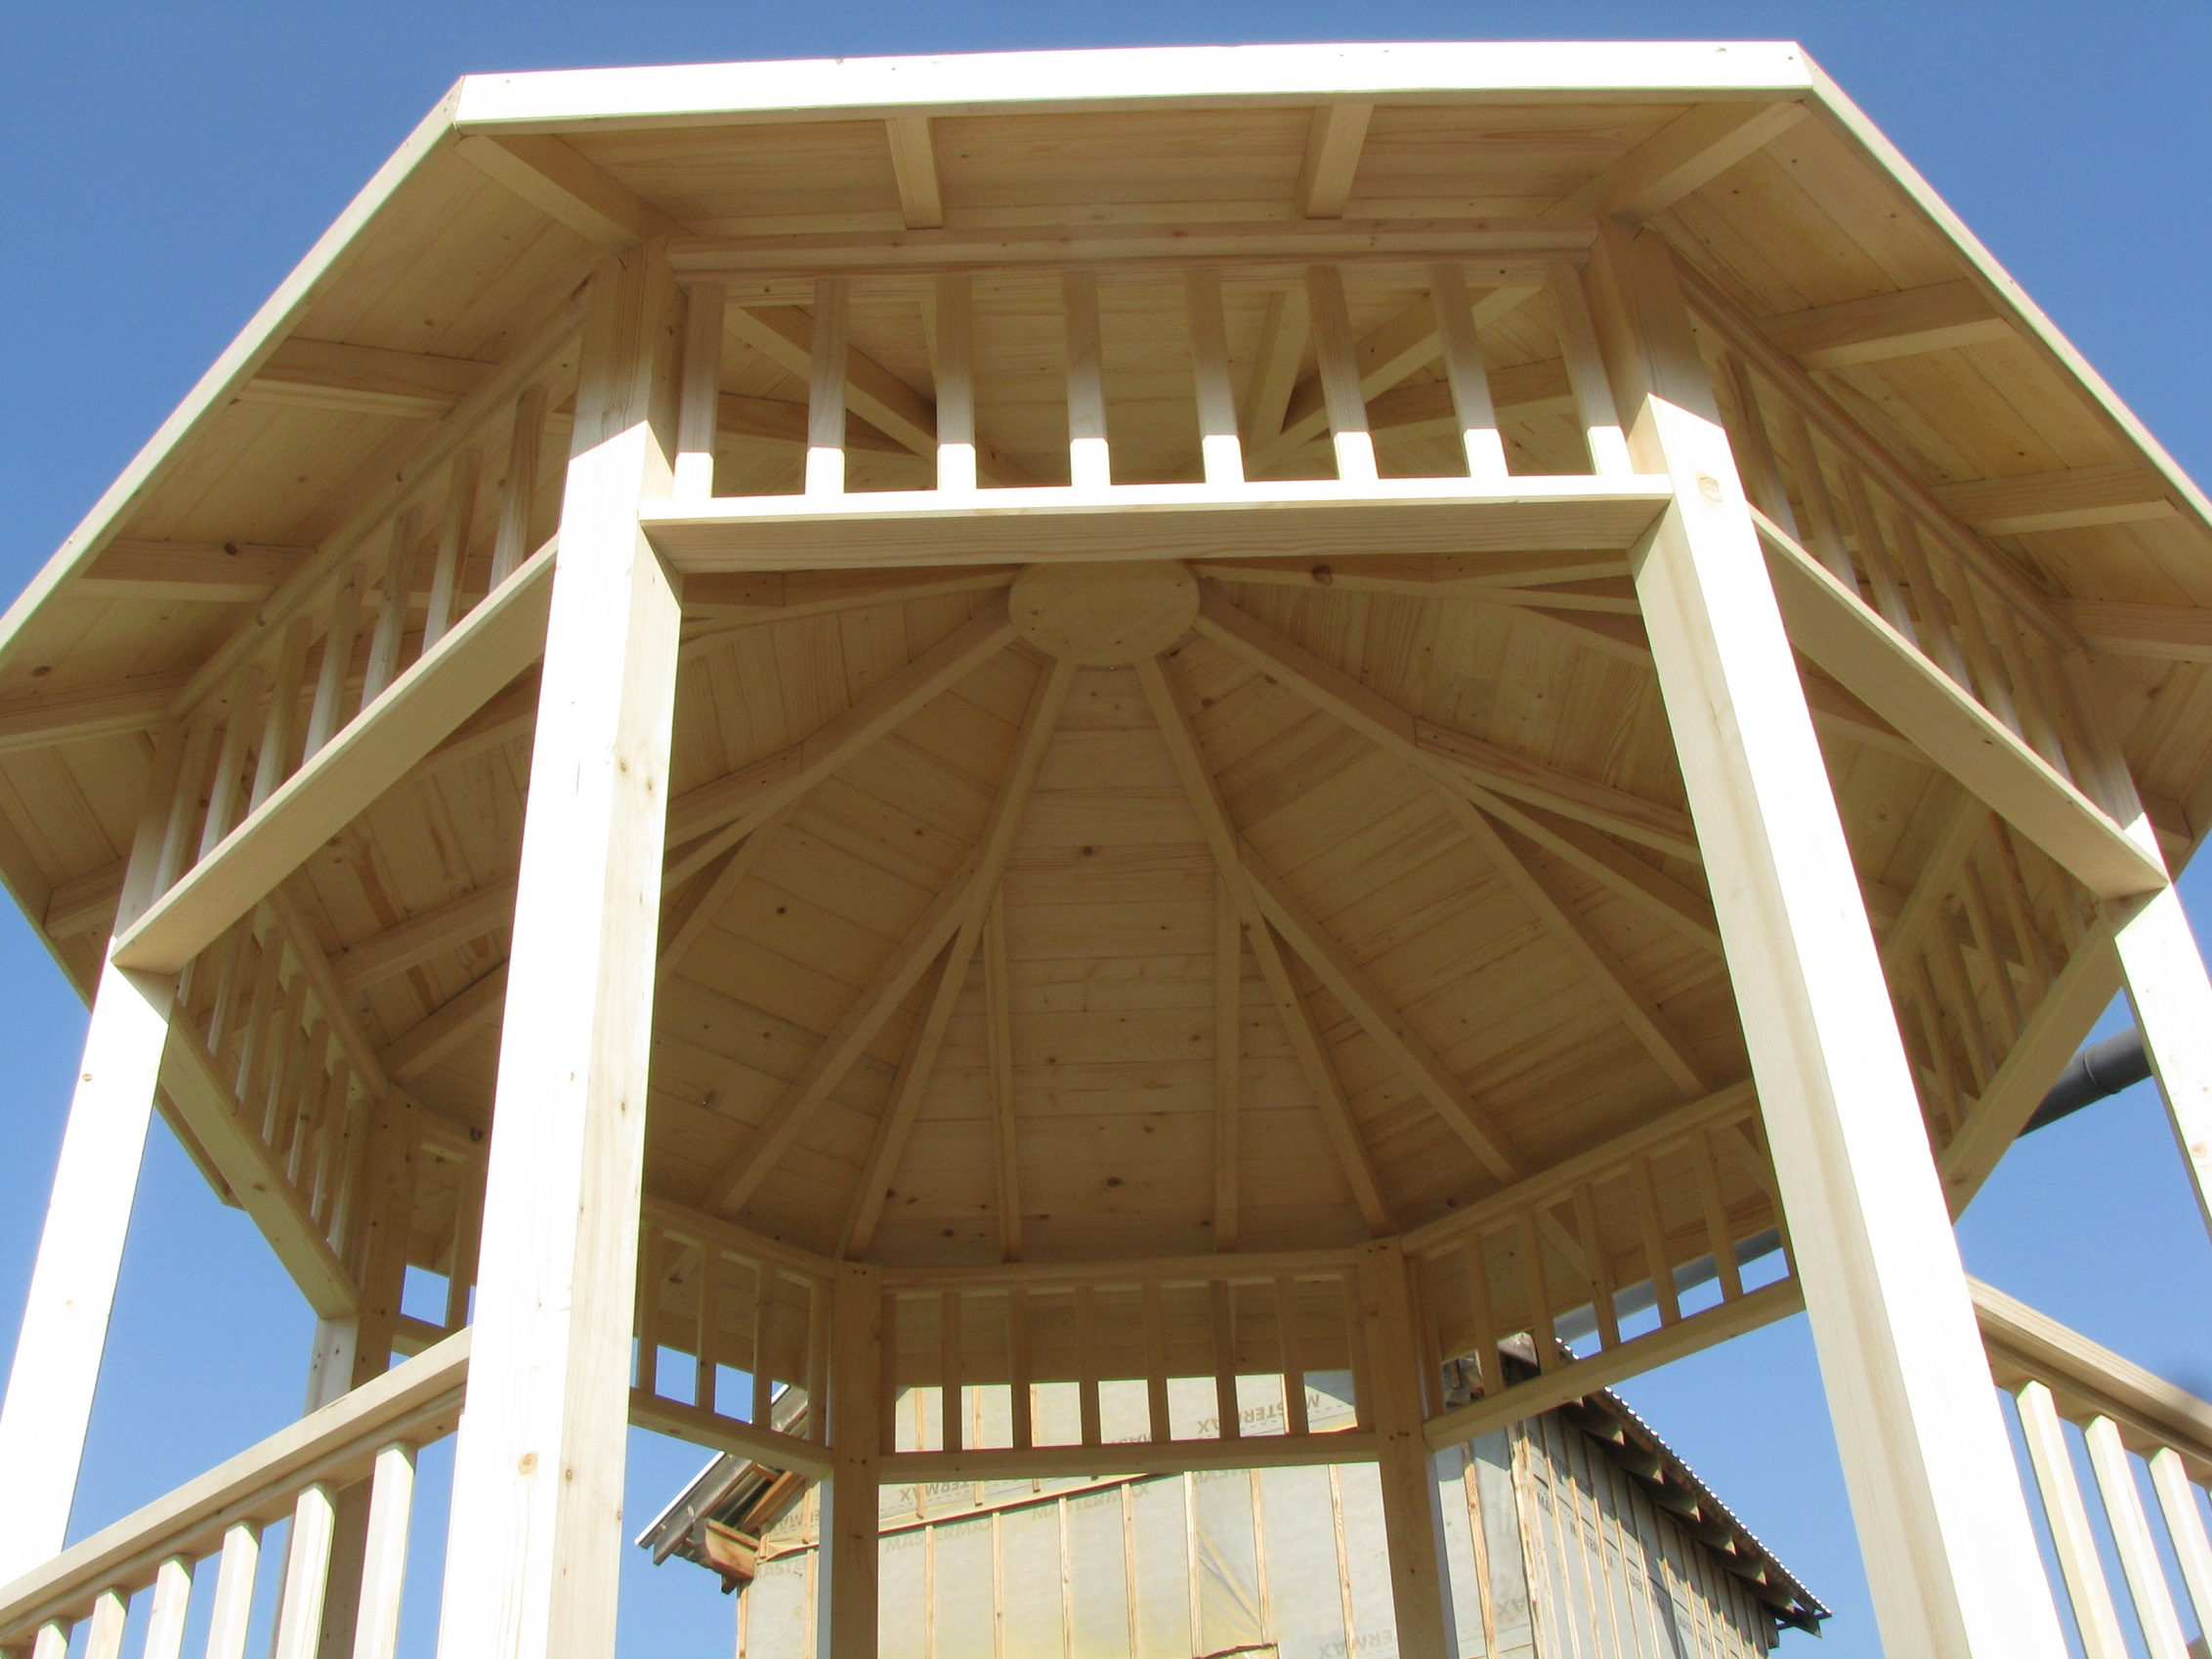 Kiosques bois sans permis de construire # Construire Un Kiosque En Bois